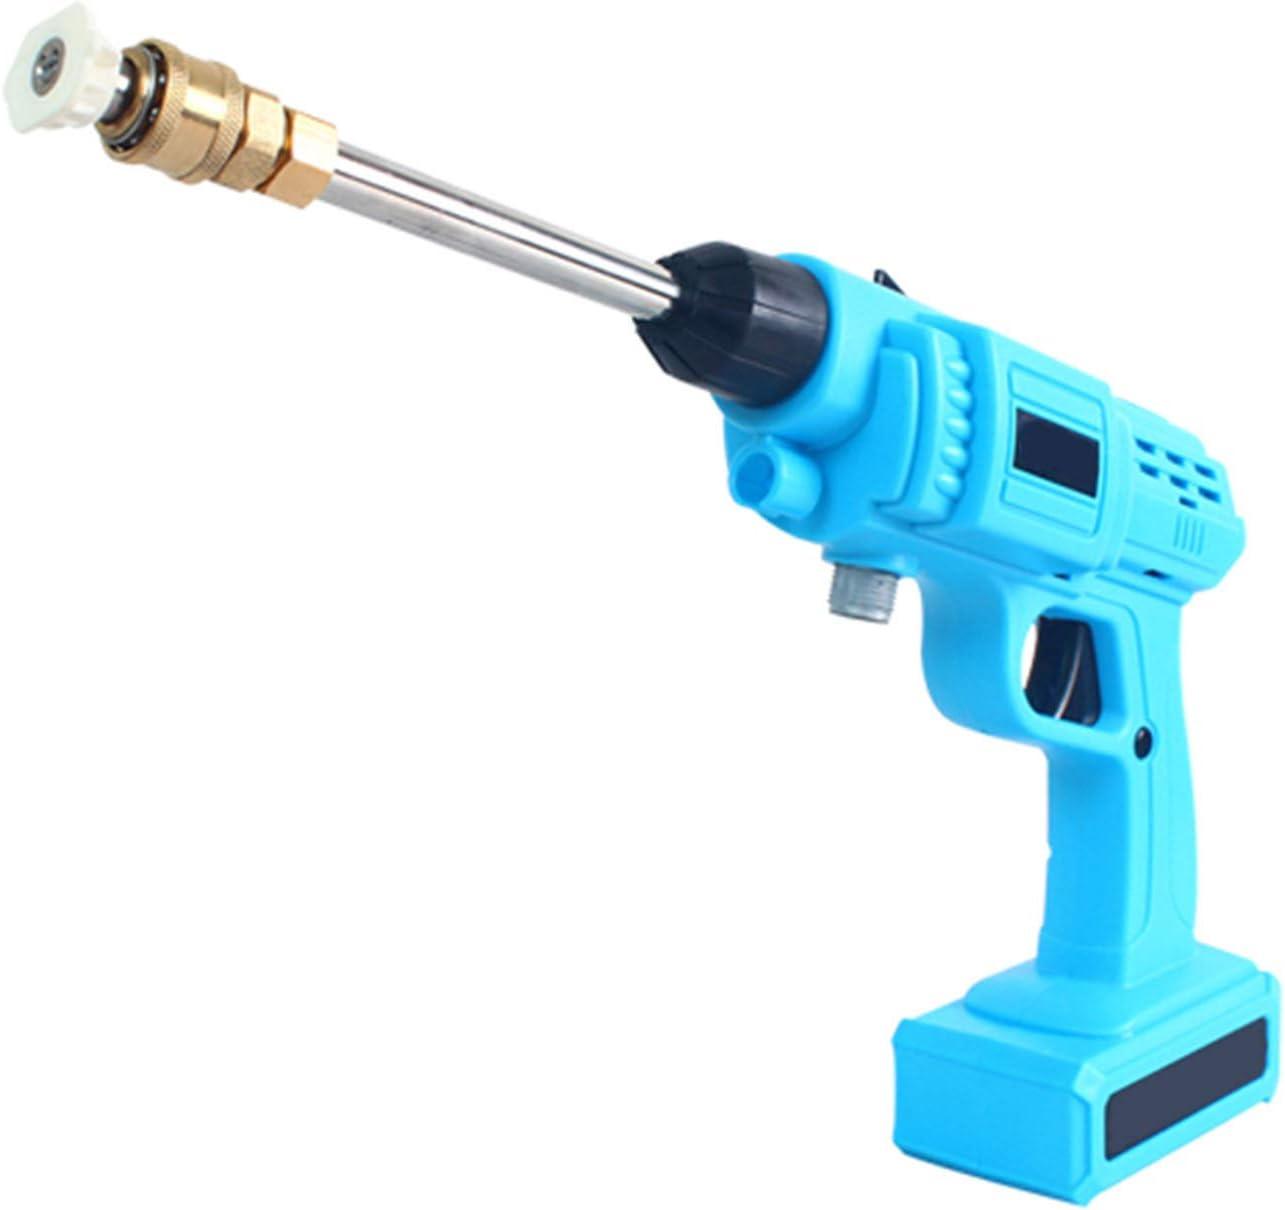 GYNFJK Lavadora de Coches inalámbrica de Alto Voltaje de 24 V, batería de Litio portátil, Pistola de Agua Recargable para Limpiar, regar y Limpiar Coches